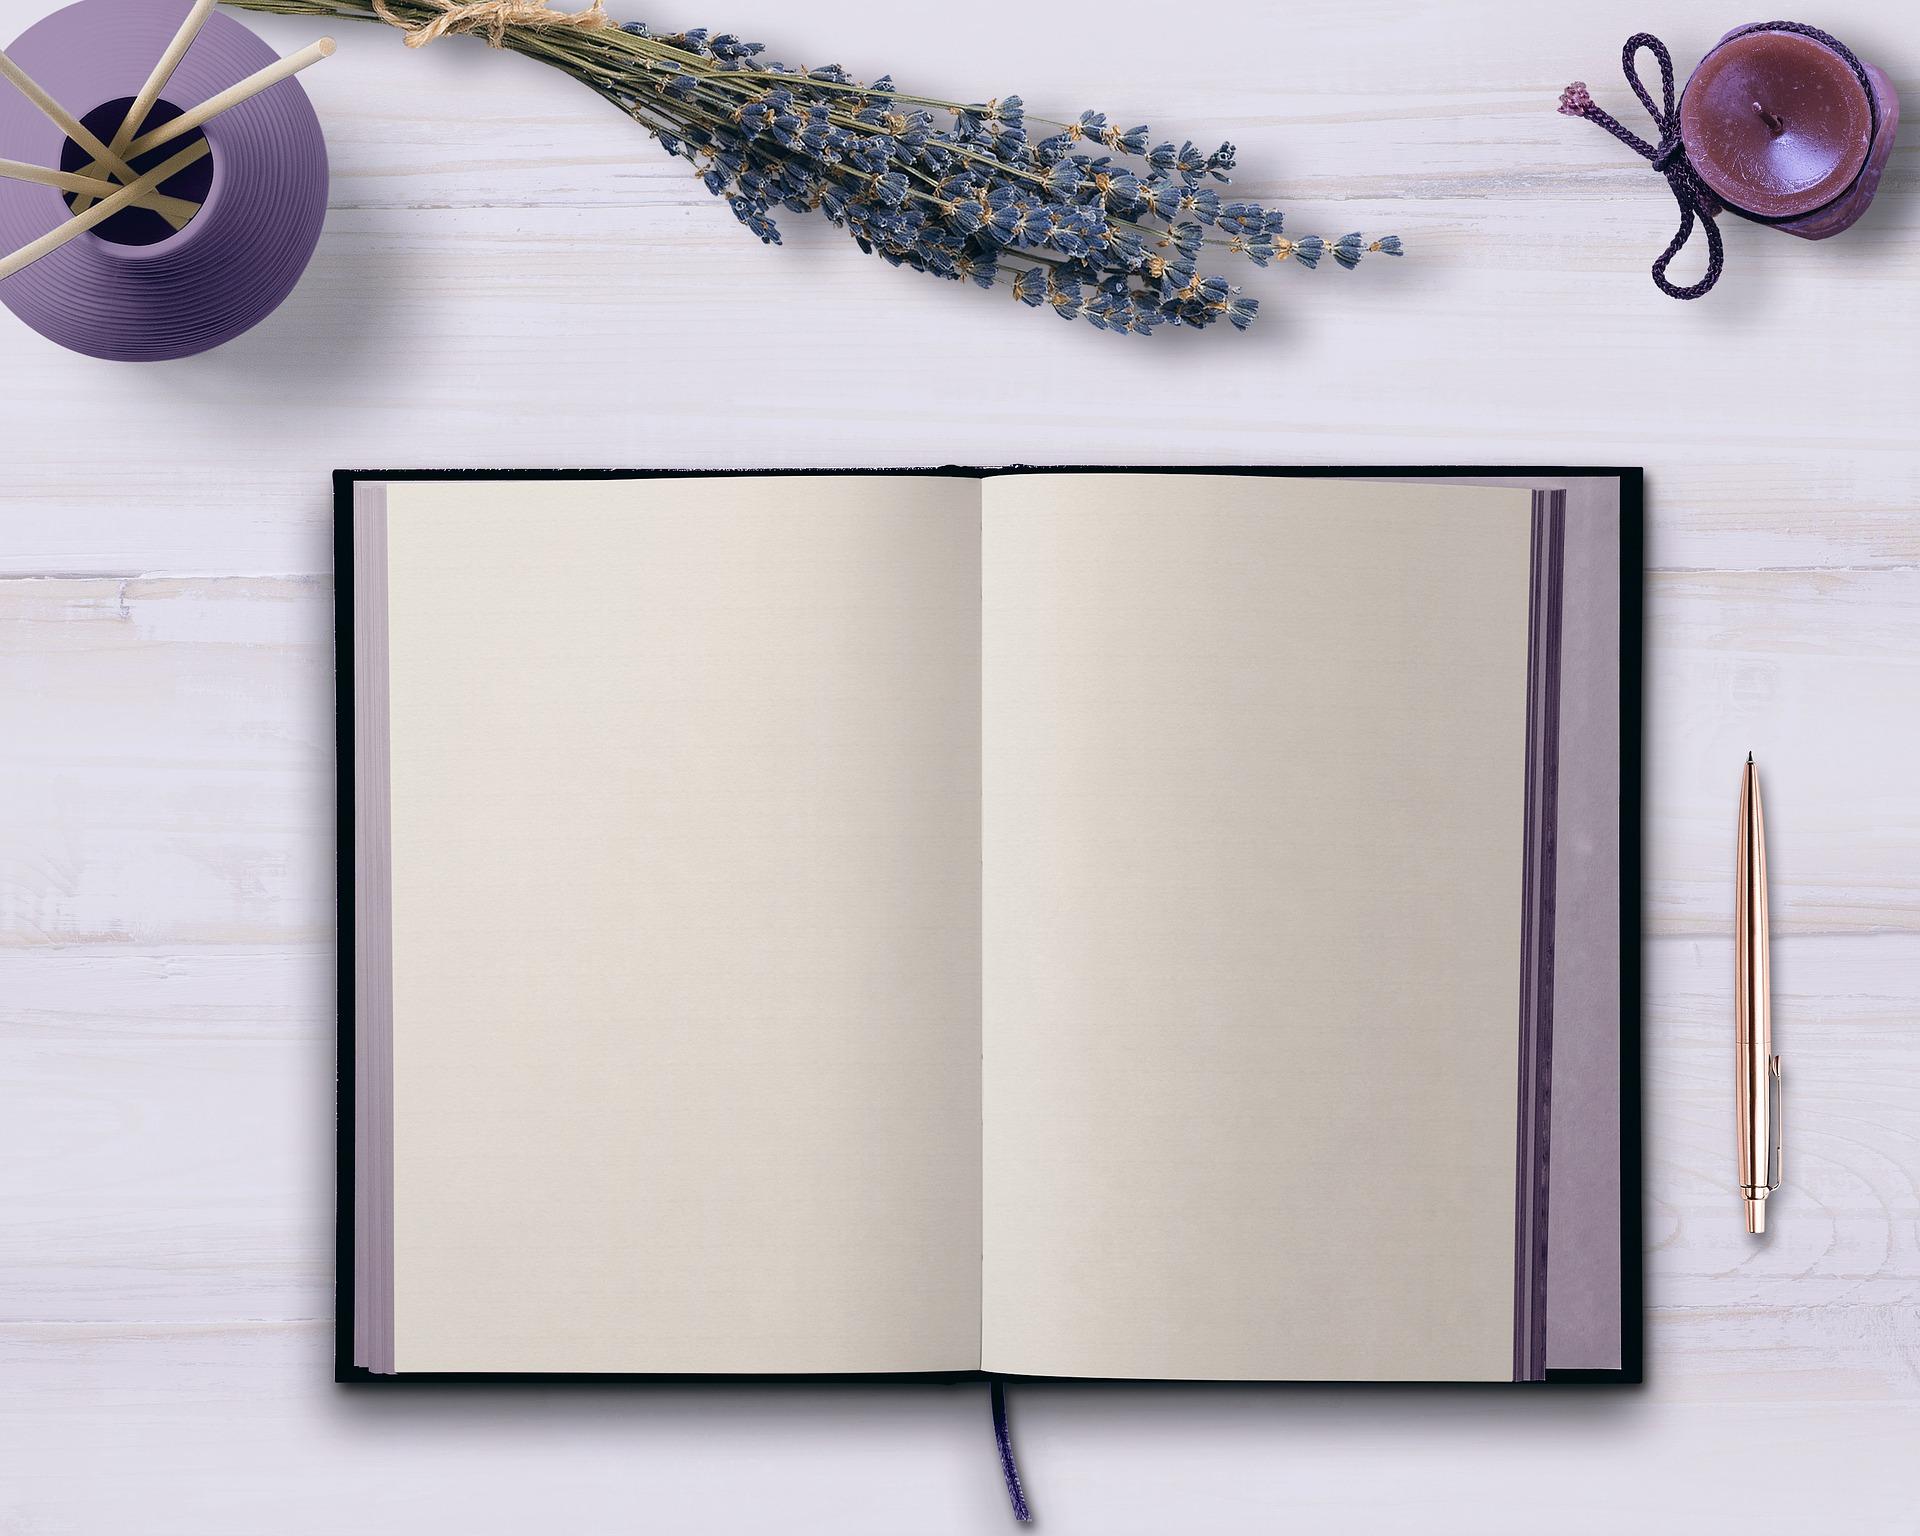 diary-3299128_1920.jpg